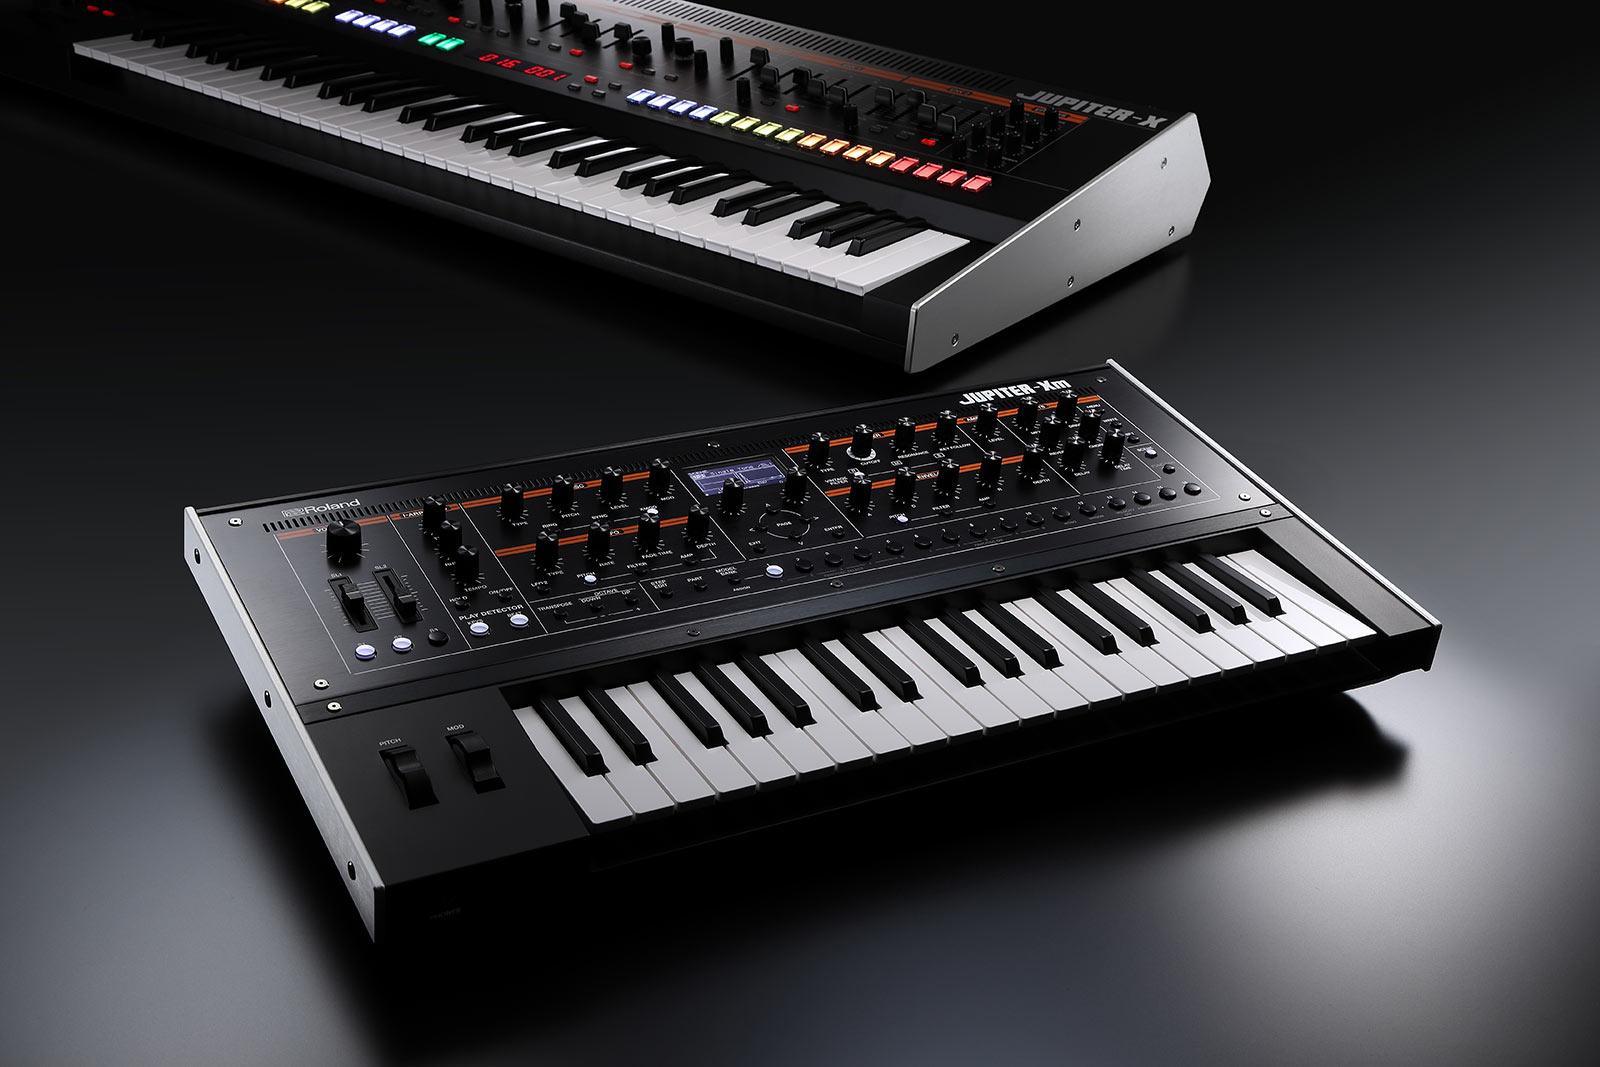 The Roland JUPITER-X & JUPITER-Xm